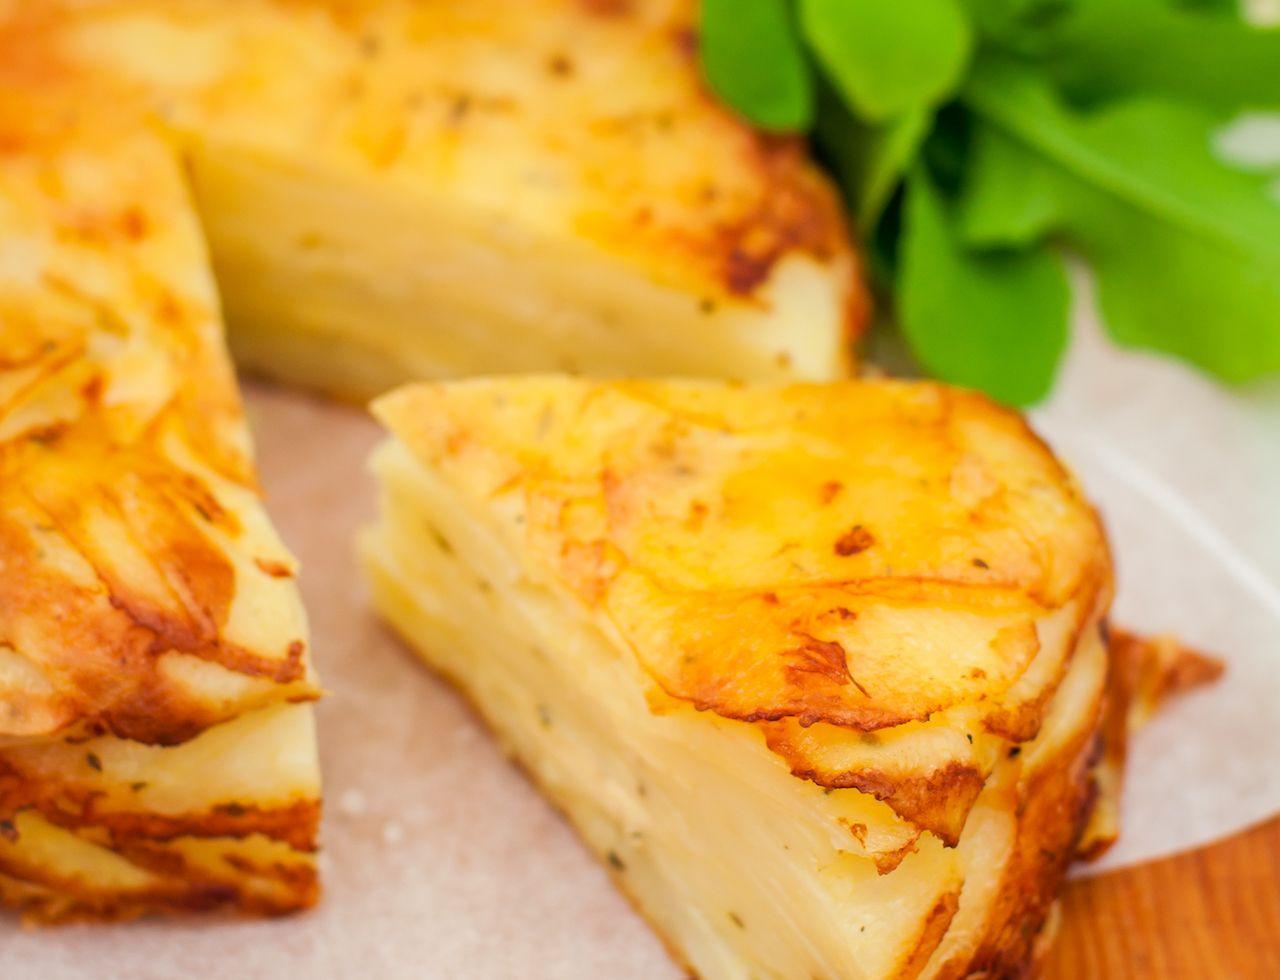 Tukmachi, upside down layered potato cake